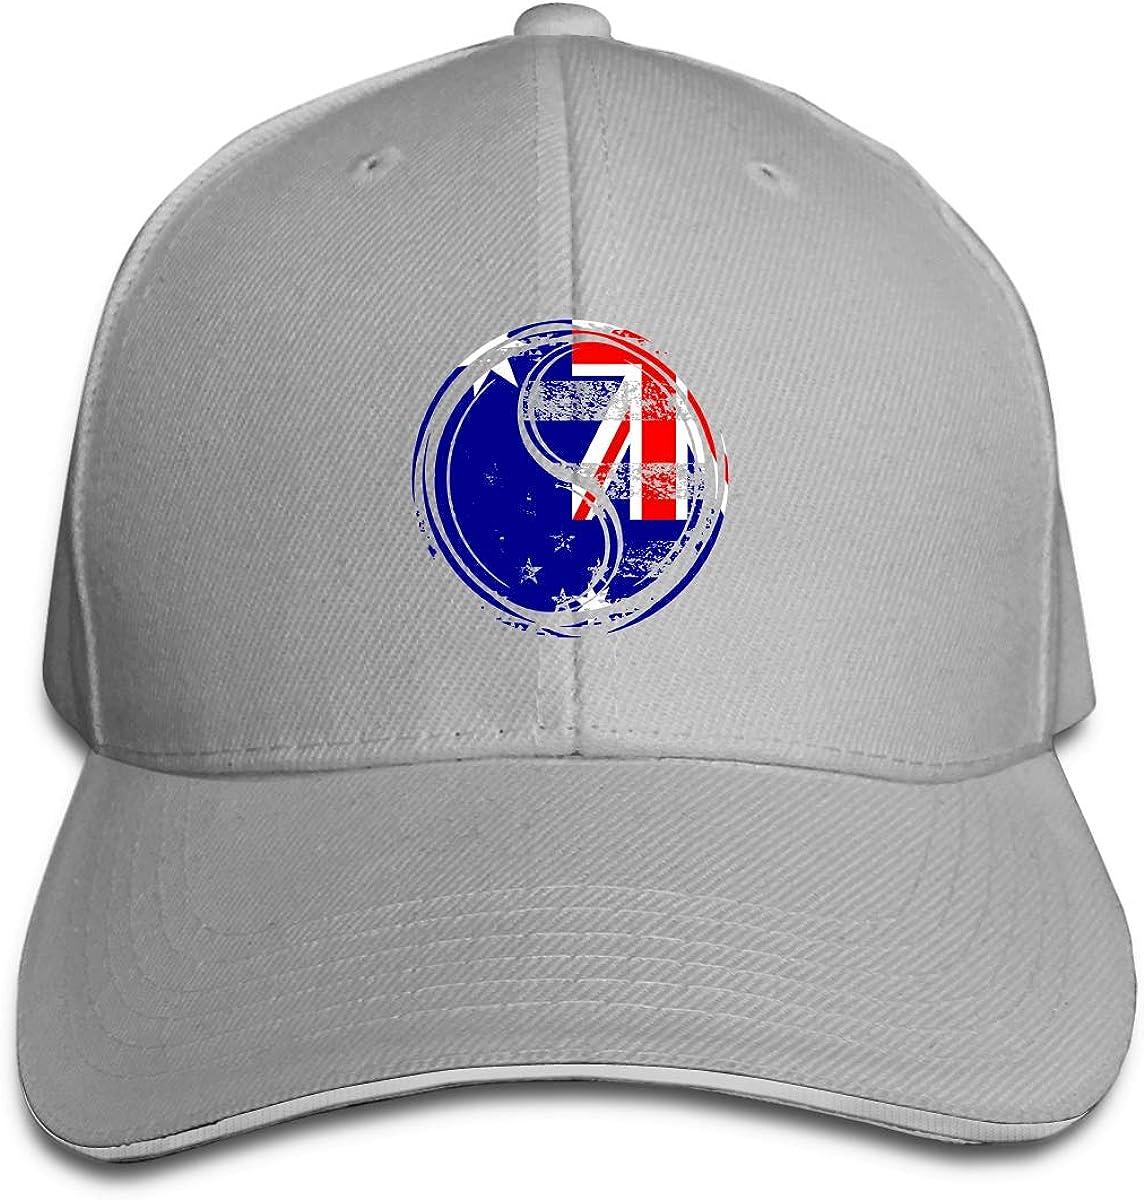 Yin Yang Australian Flag Outdoor Snapback Sandwich Cap Adjustable Baseball Hat Dad Hat